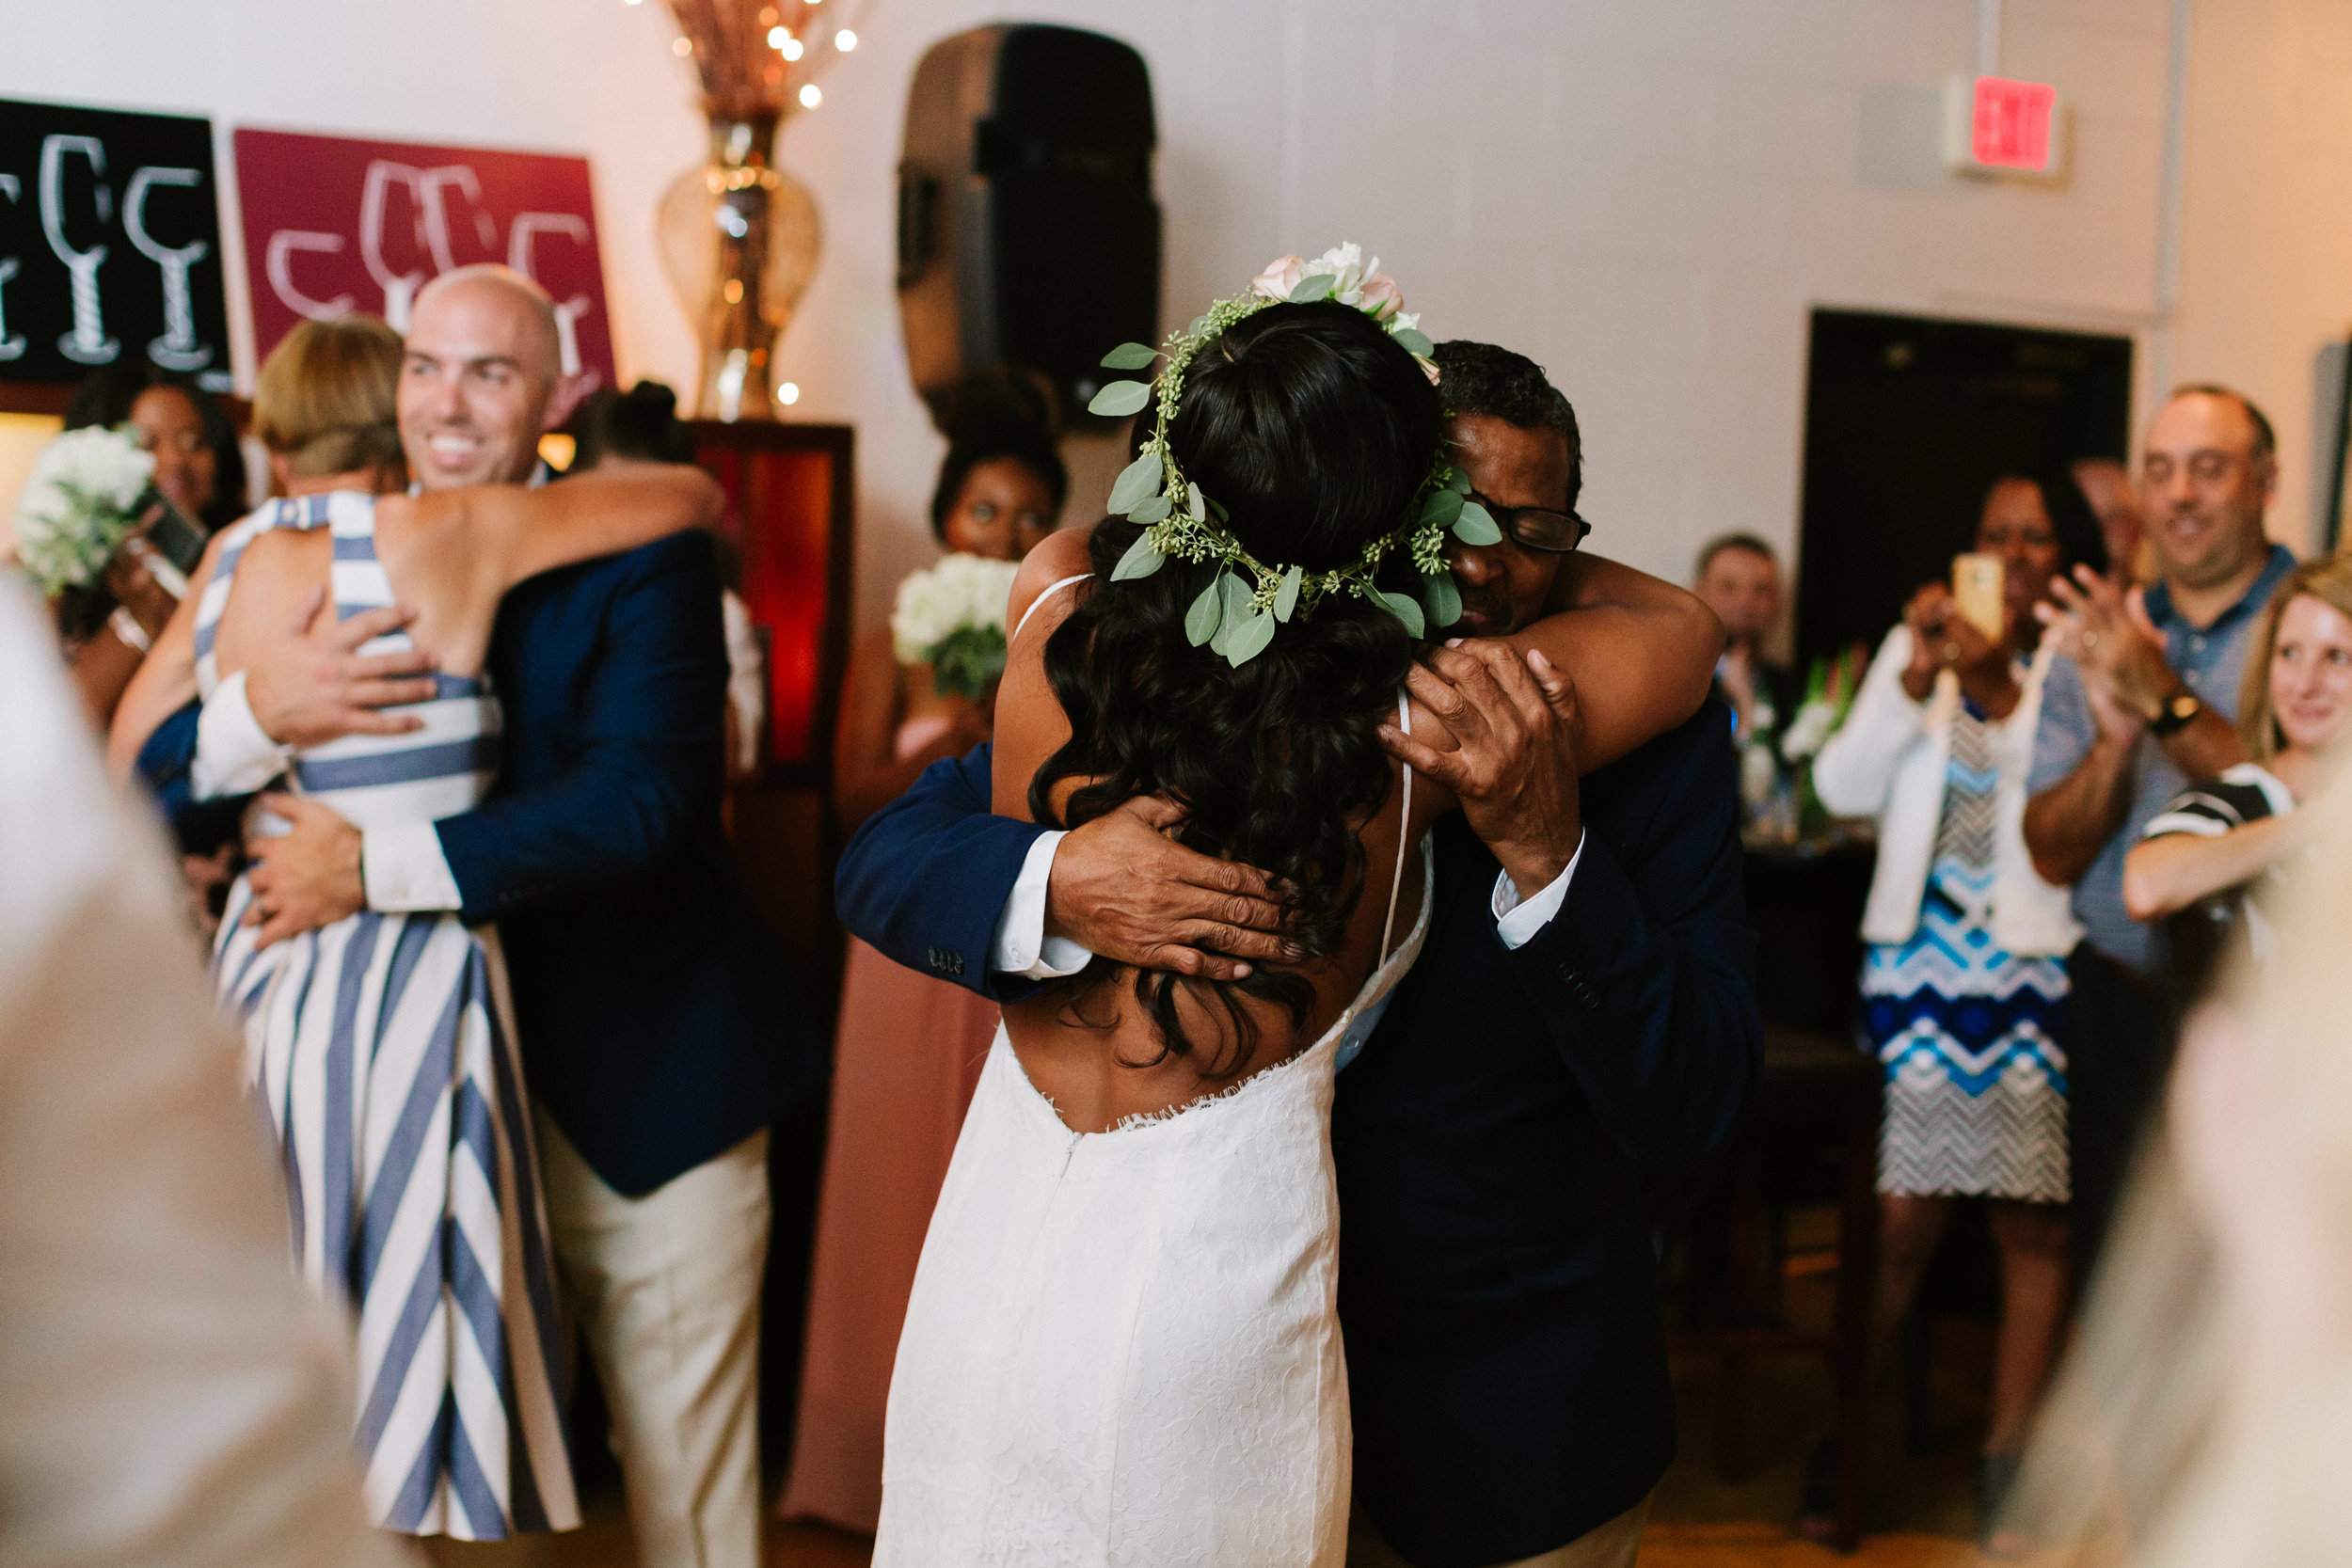 2017.09.16 Ashley and Chuck O'Day Quantam Leap Winery Wedding (344 of 462).jpg